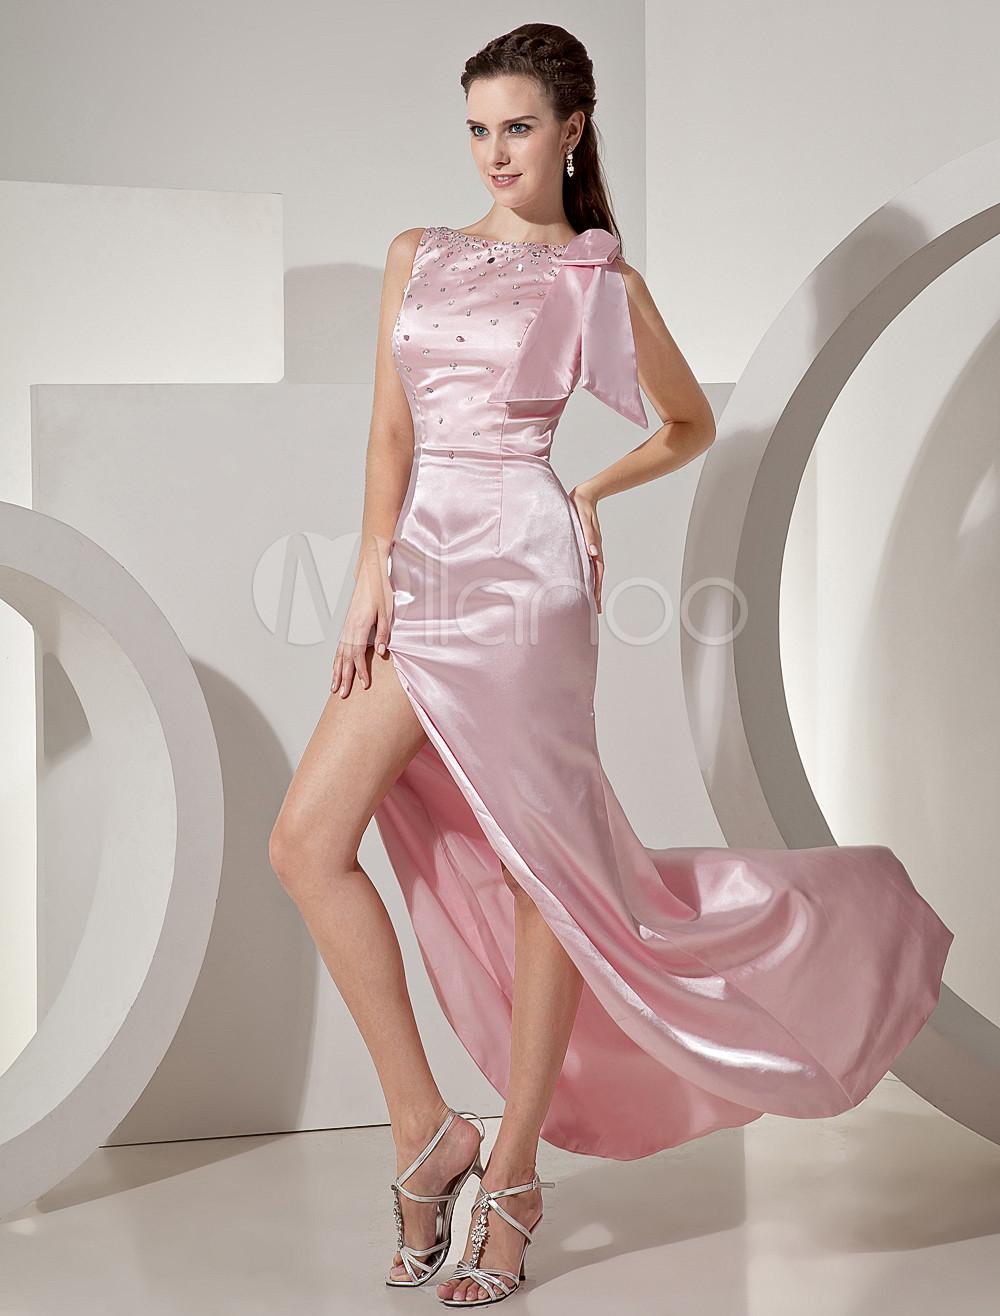 Sexy Pink Elastic Woven Satin Beading Side Split Women's Prom Dress (Wedding Prom Dresses) photo